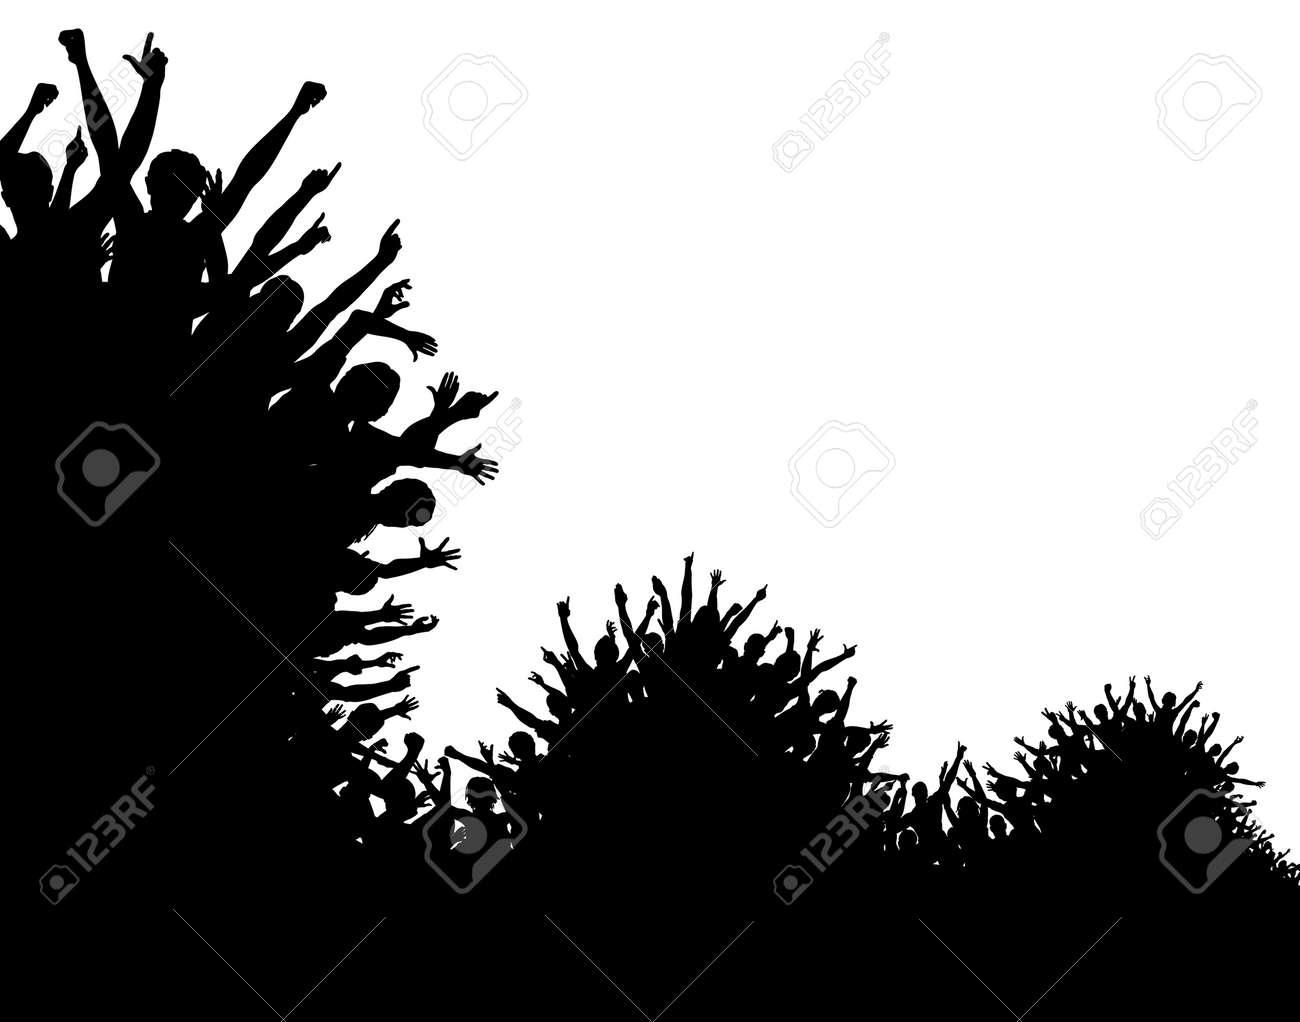 Editable vector design of a wavy crowd silhouette Stock Vector - 4538152